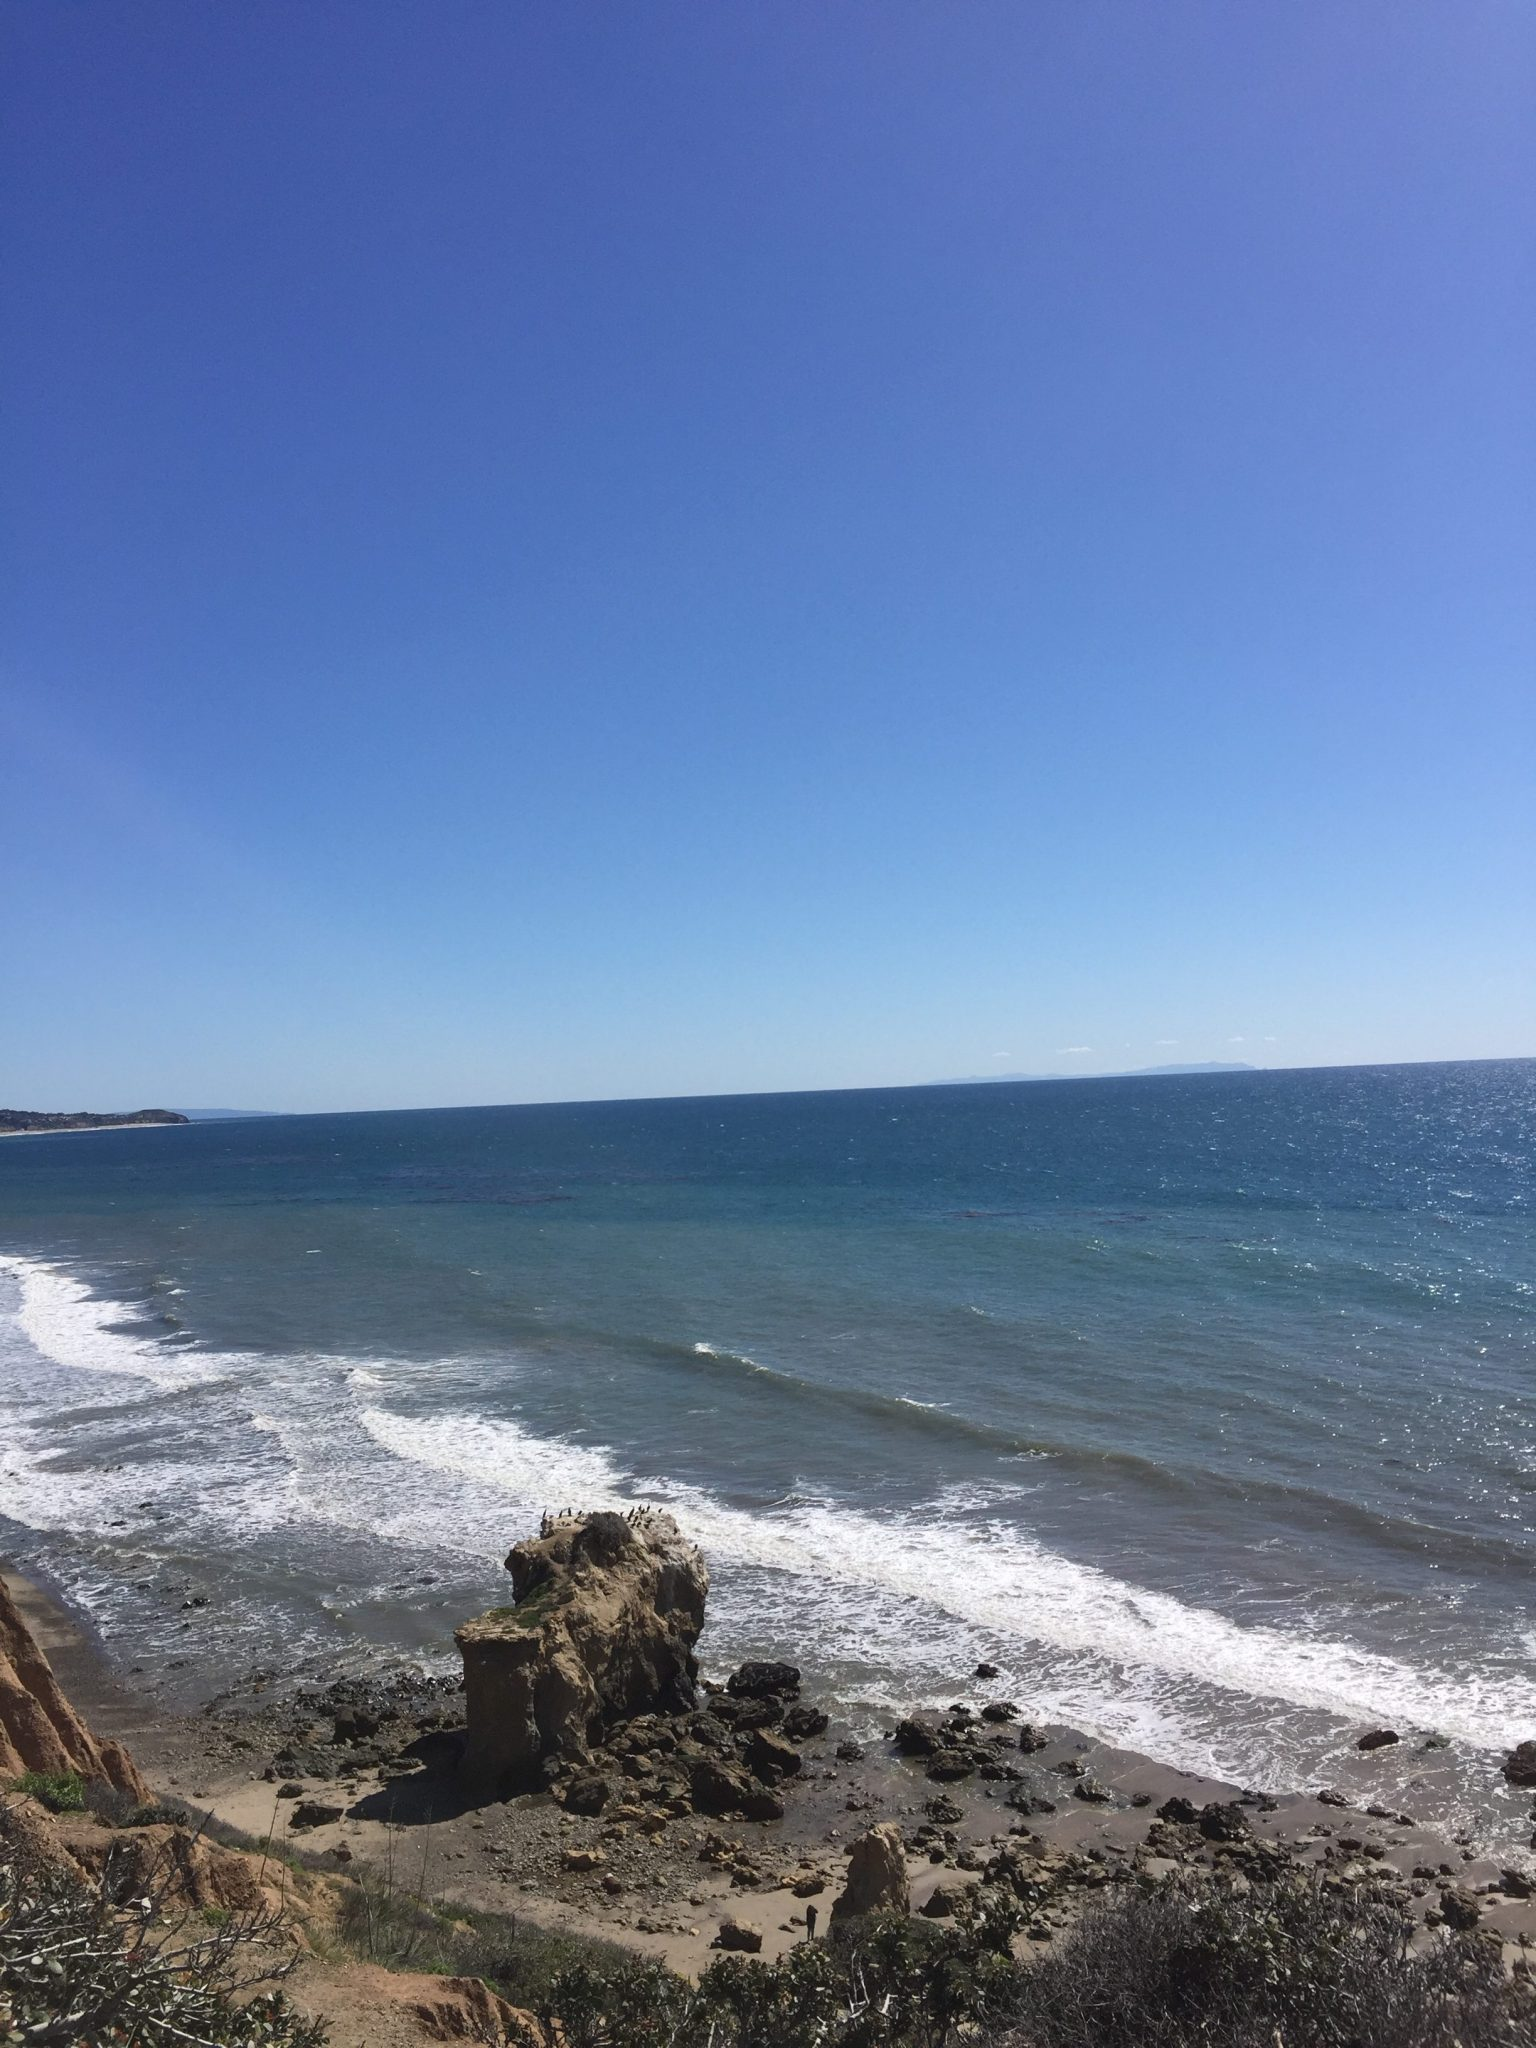 Los Angeles Venice Santa Monica Malibu World Travel Scout